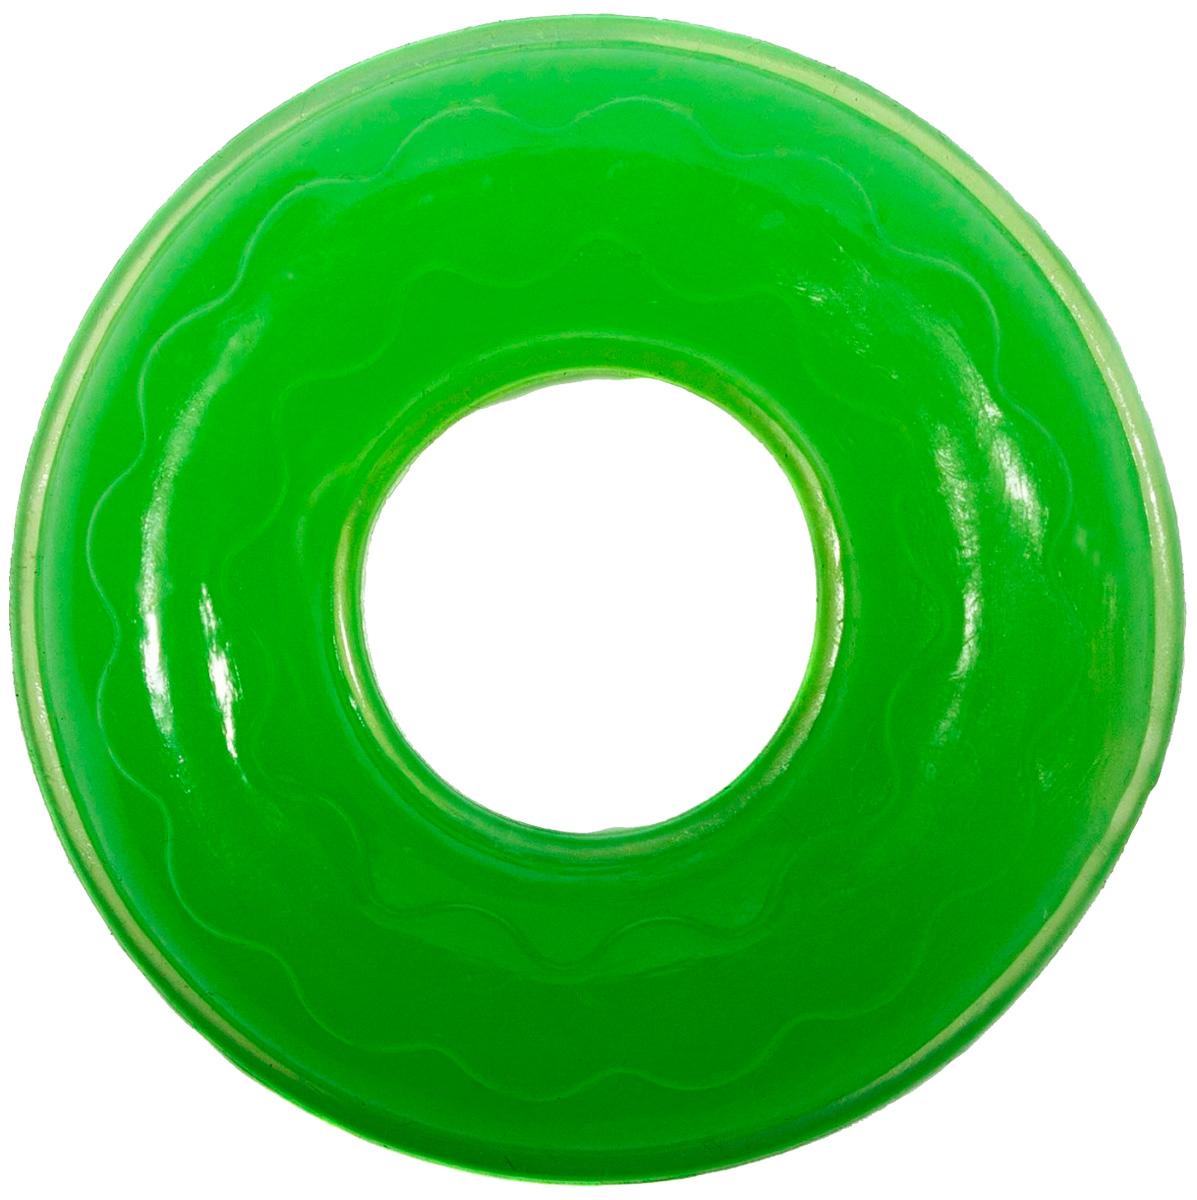 Игрушка для собак Doglike Кольцо Мини зеленое (1 шт)